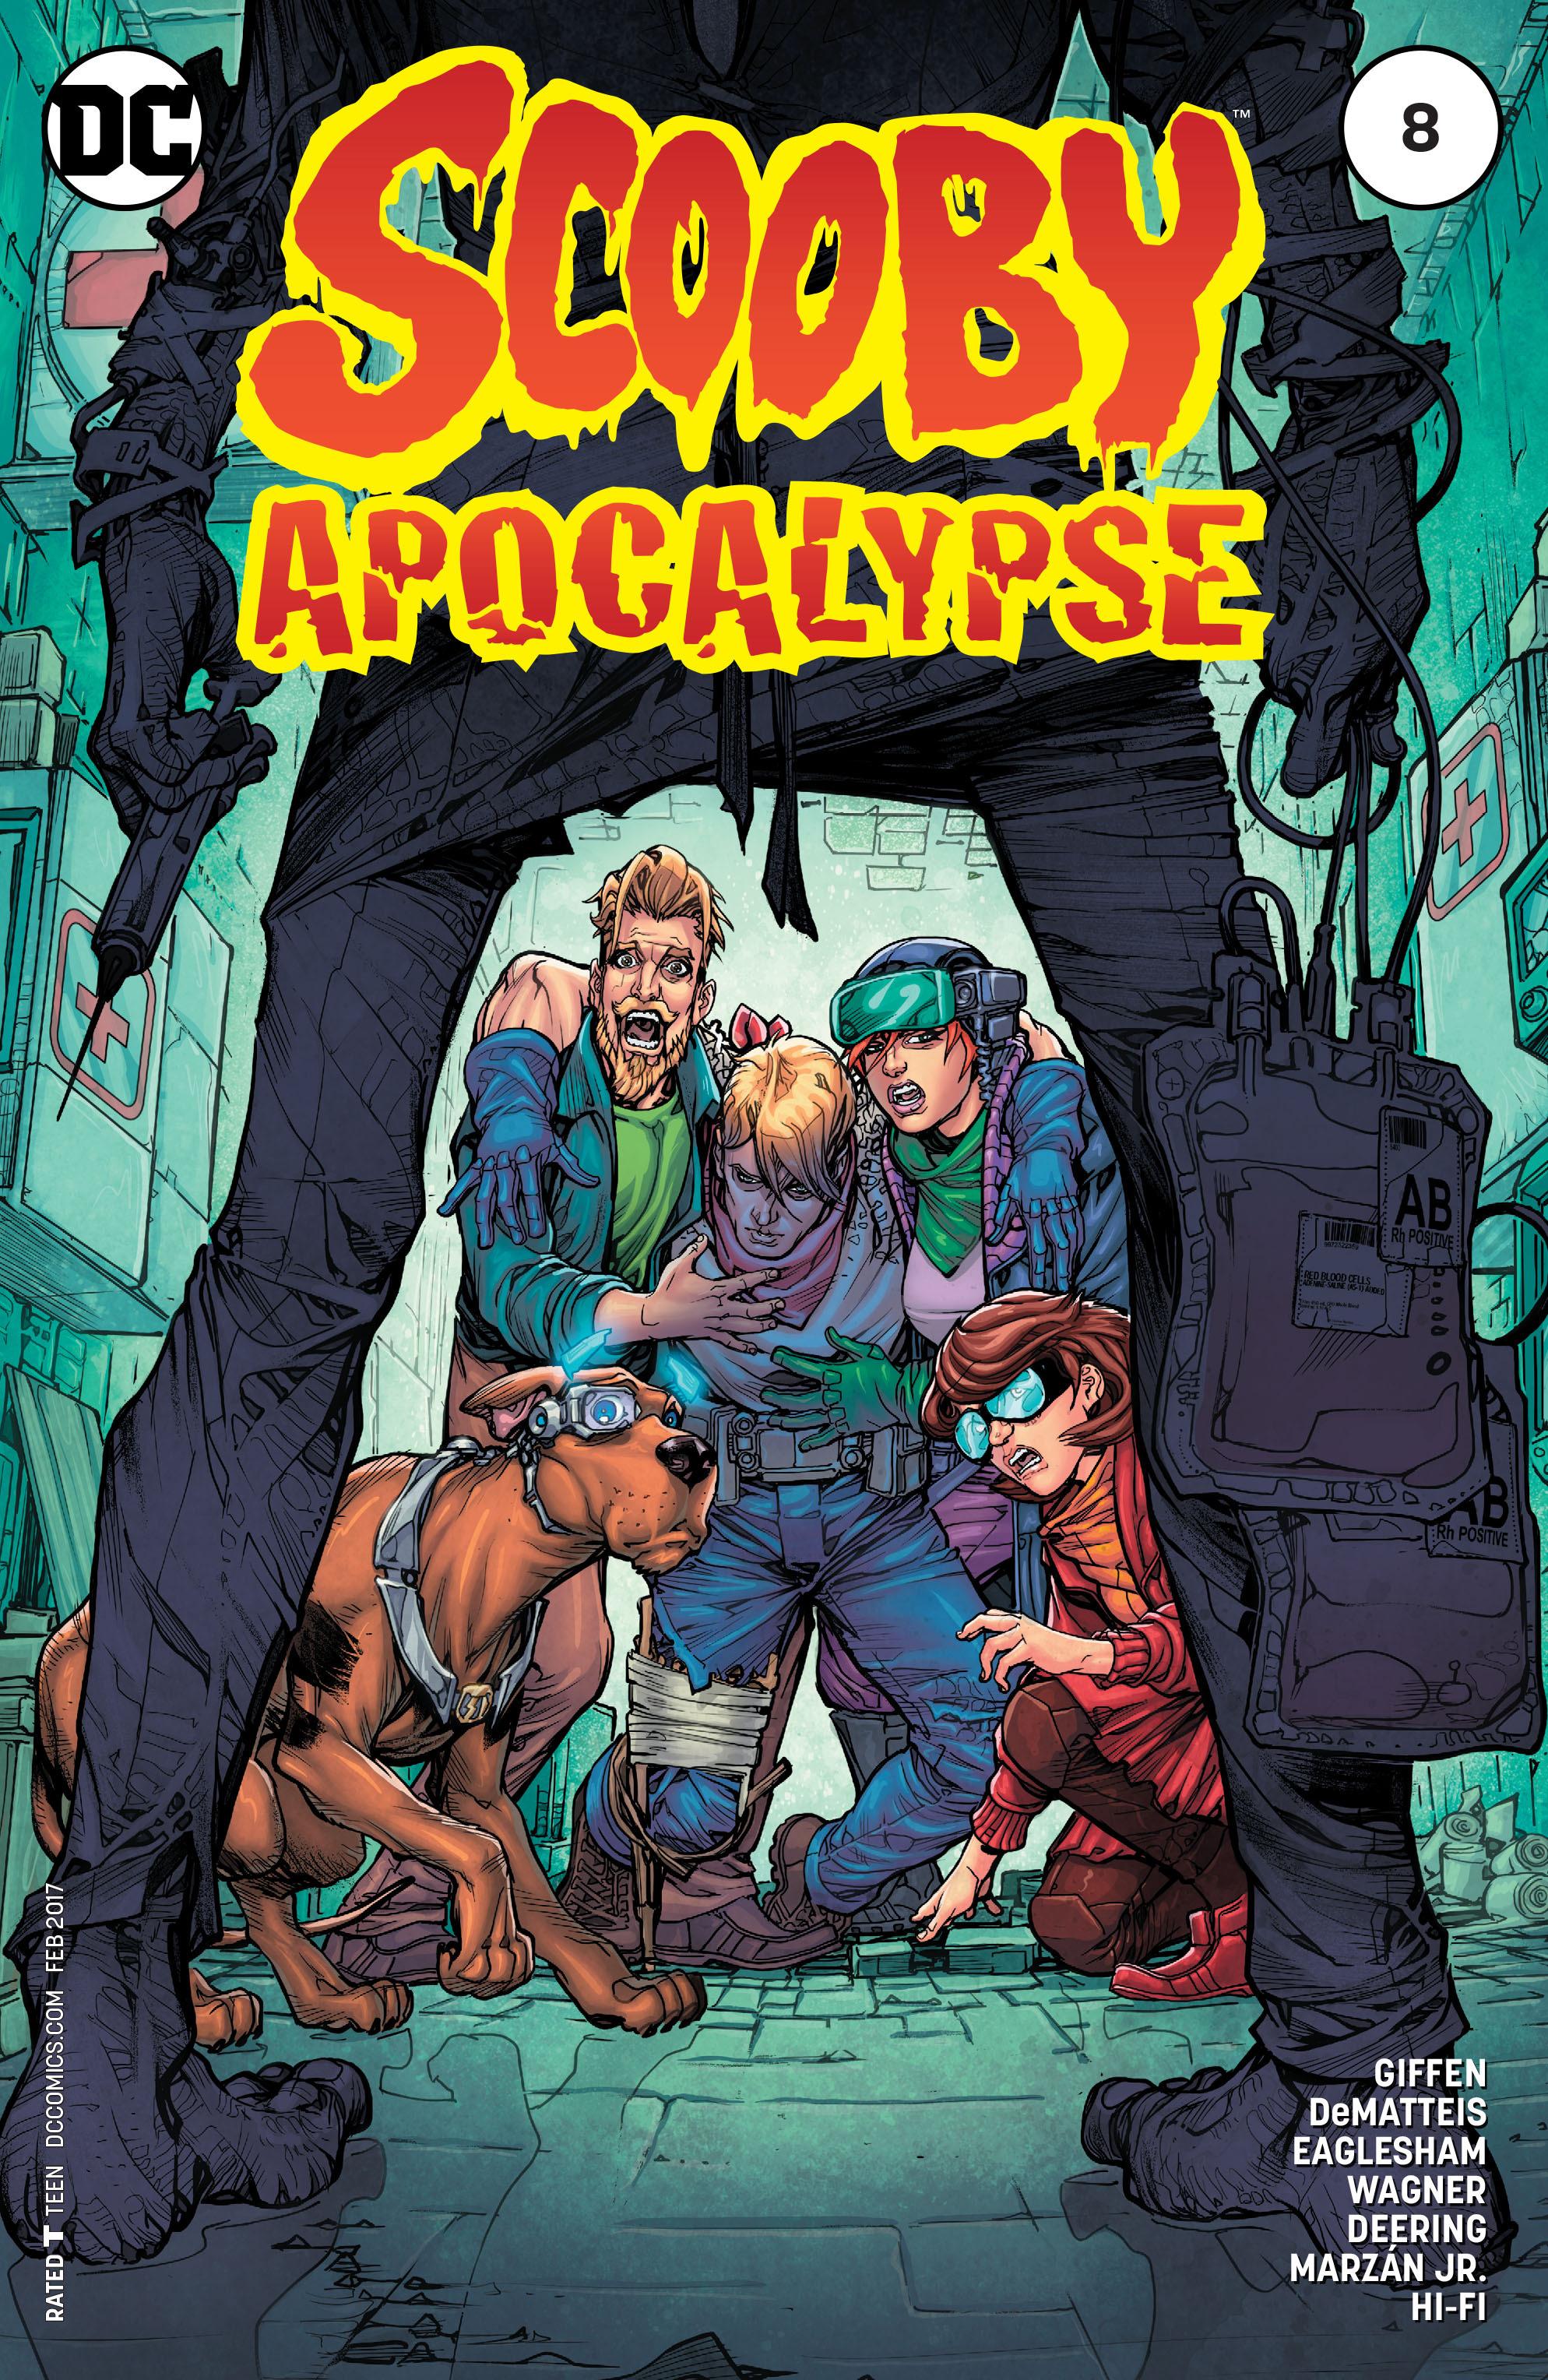 Read online Scooby Apocalypse comic -  Issue #8 - 1